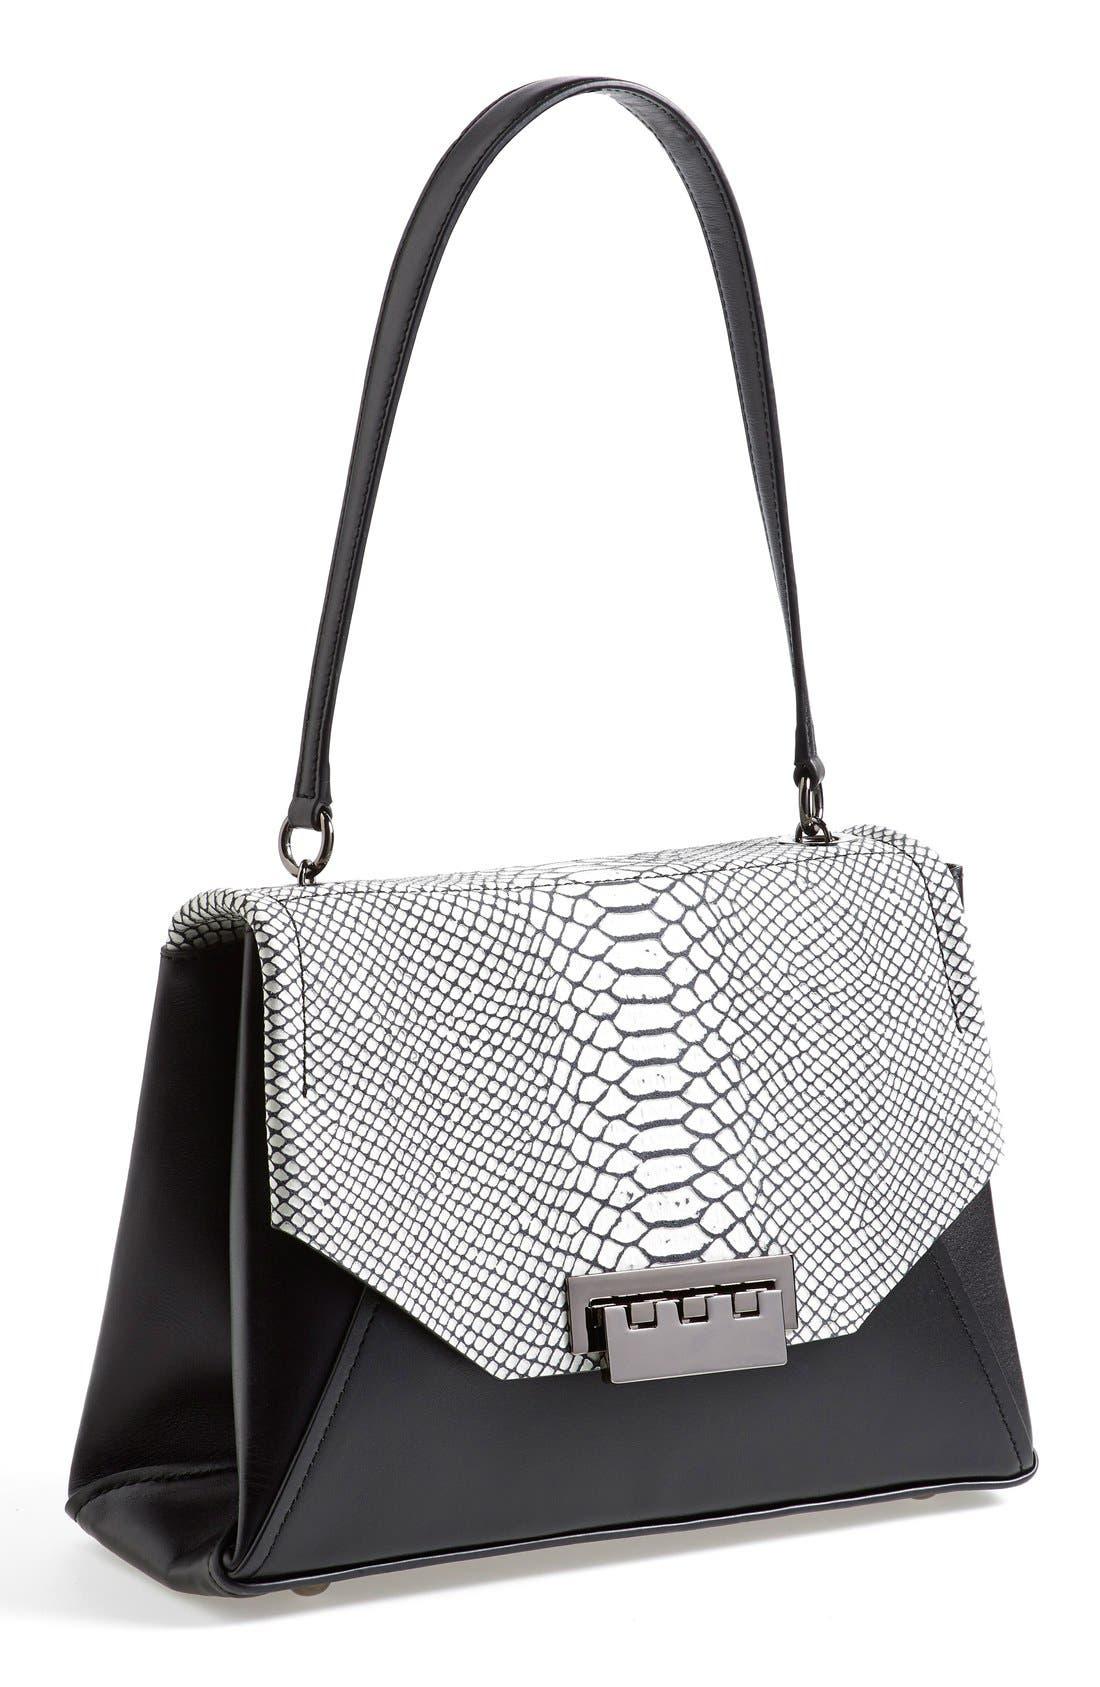 Main Image - ZAC Zac Posen 'Eartha' Envelope Flap Shoulder Bag